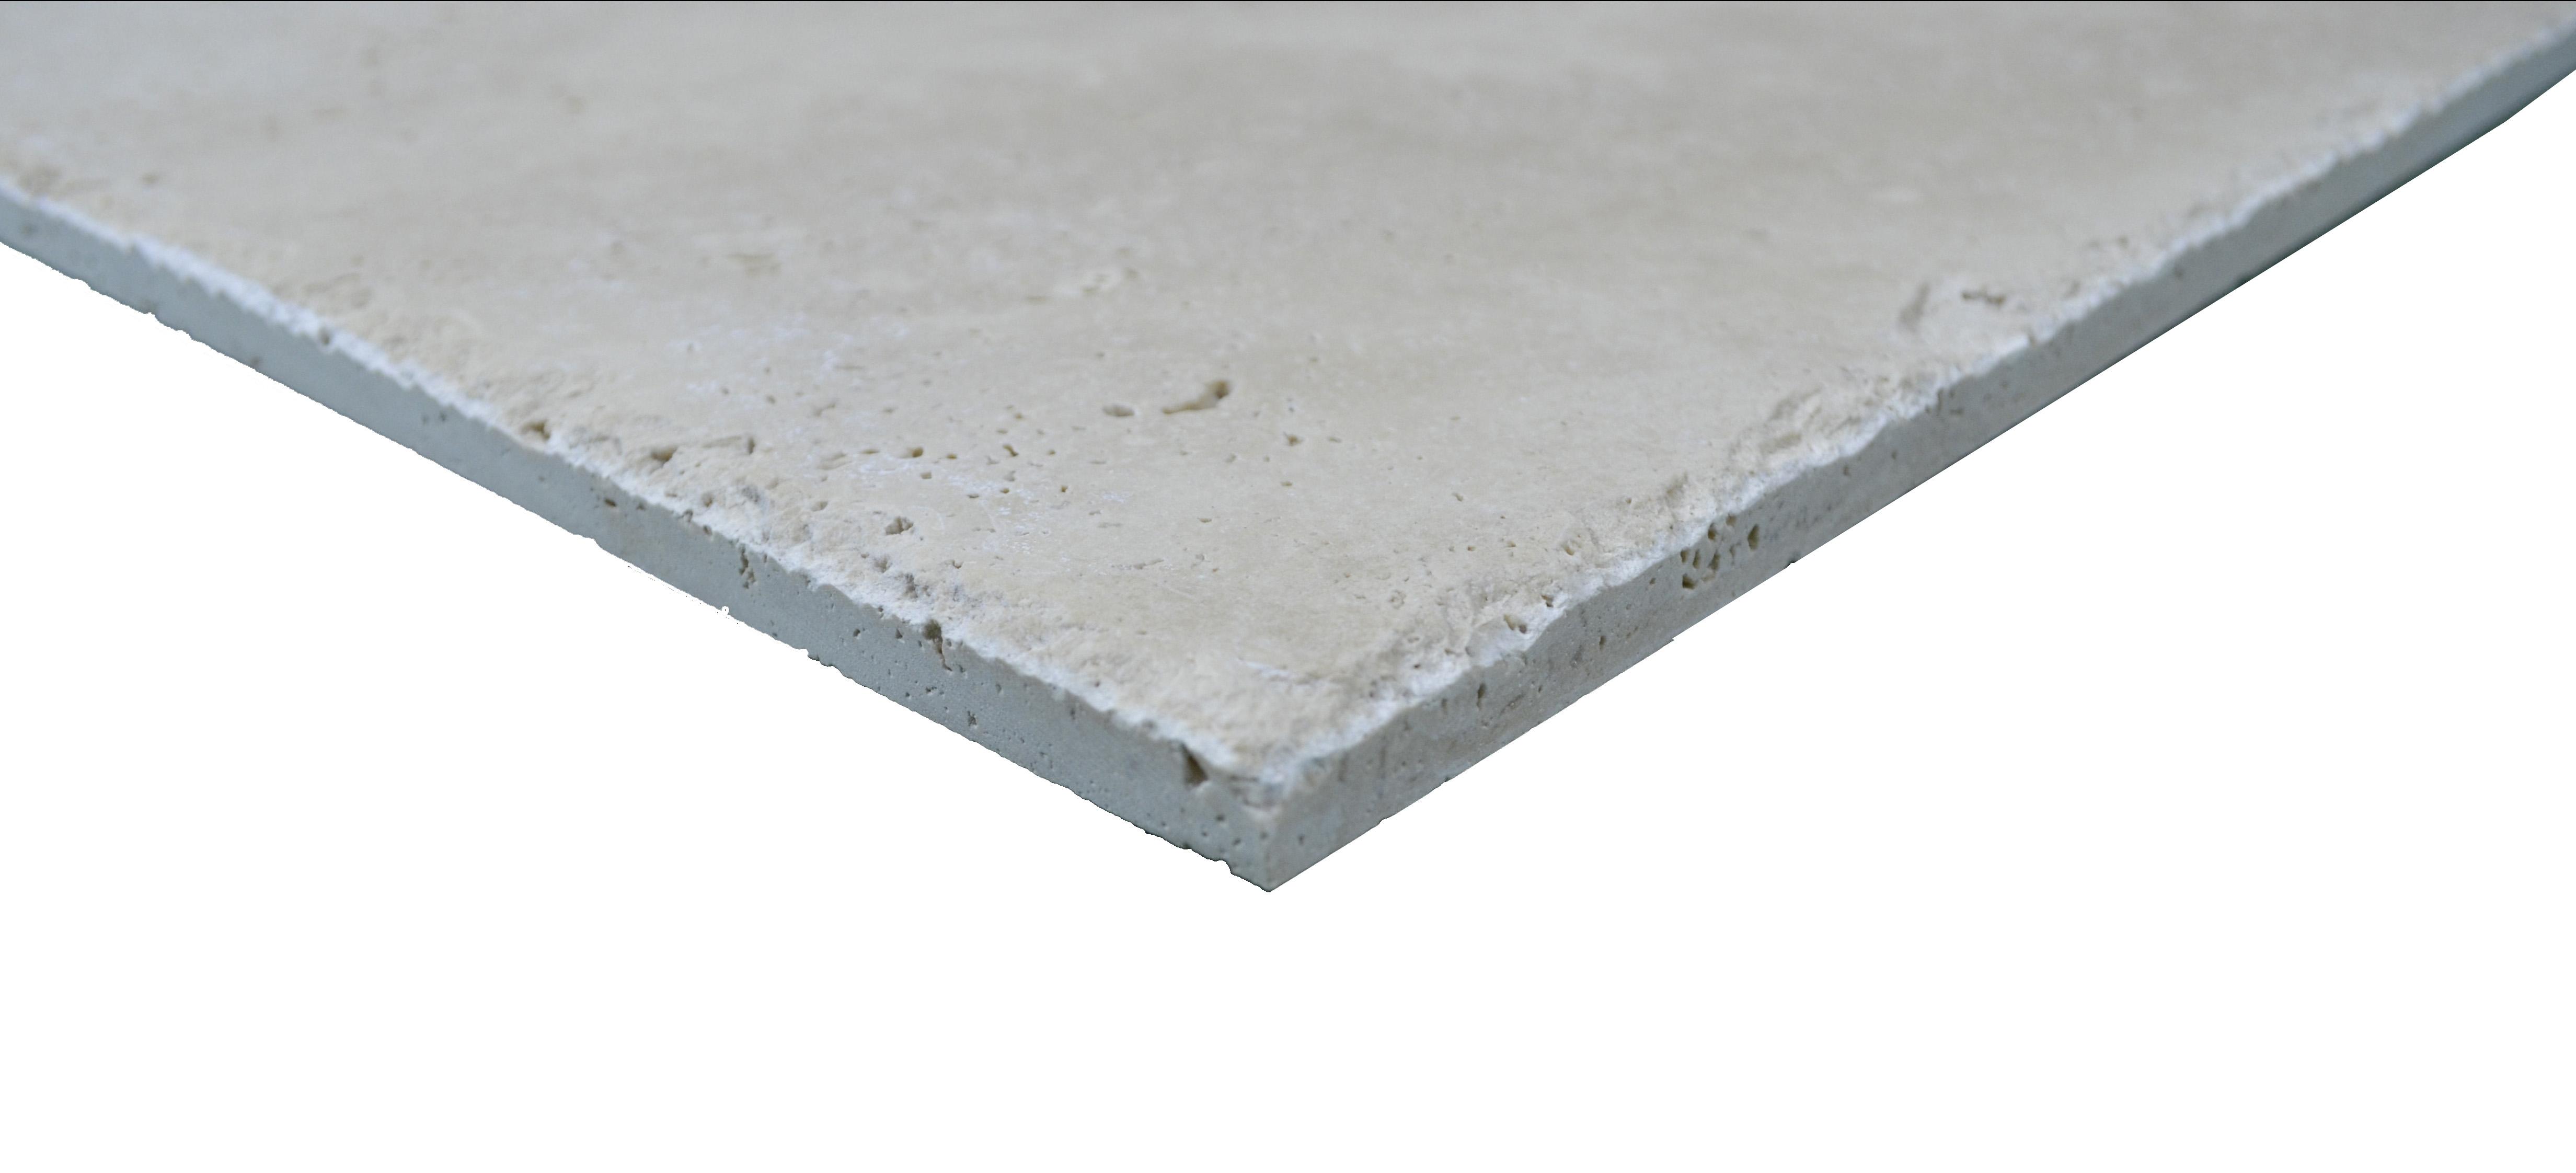 Super Light Brushed Chiseled Travertine Tiles 24x24-Travertine tile sale-Atlantic Stone Source